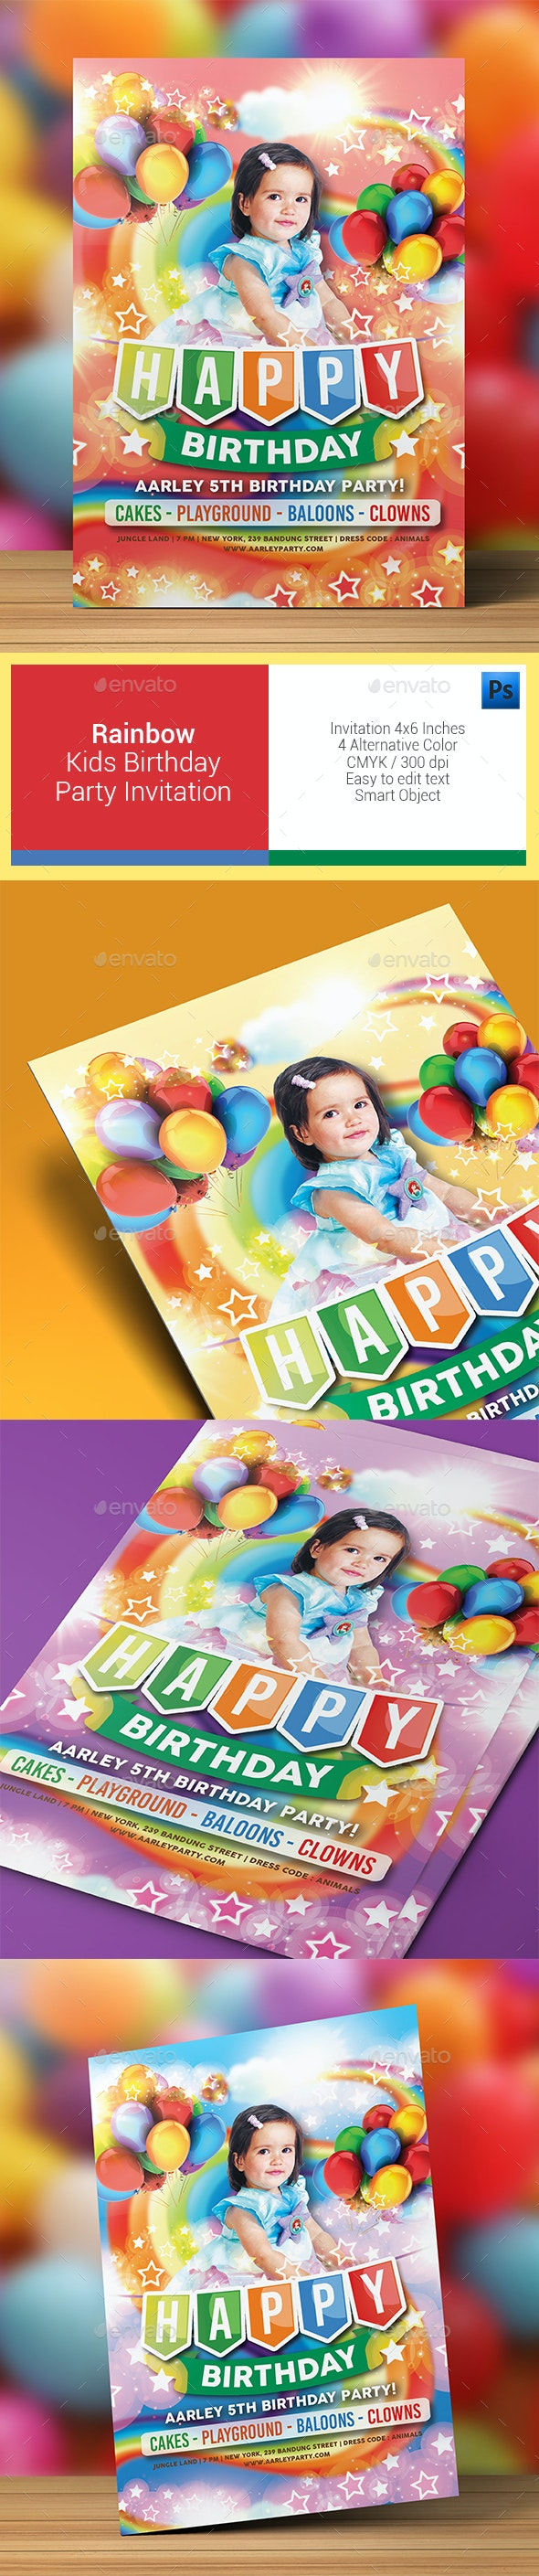 Rainbow Kids Birthday Party Invitation - Birthday Greeting Cards